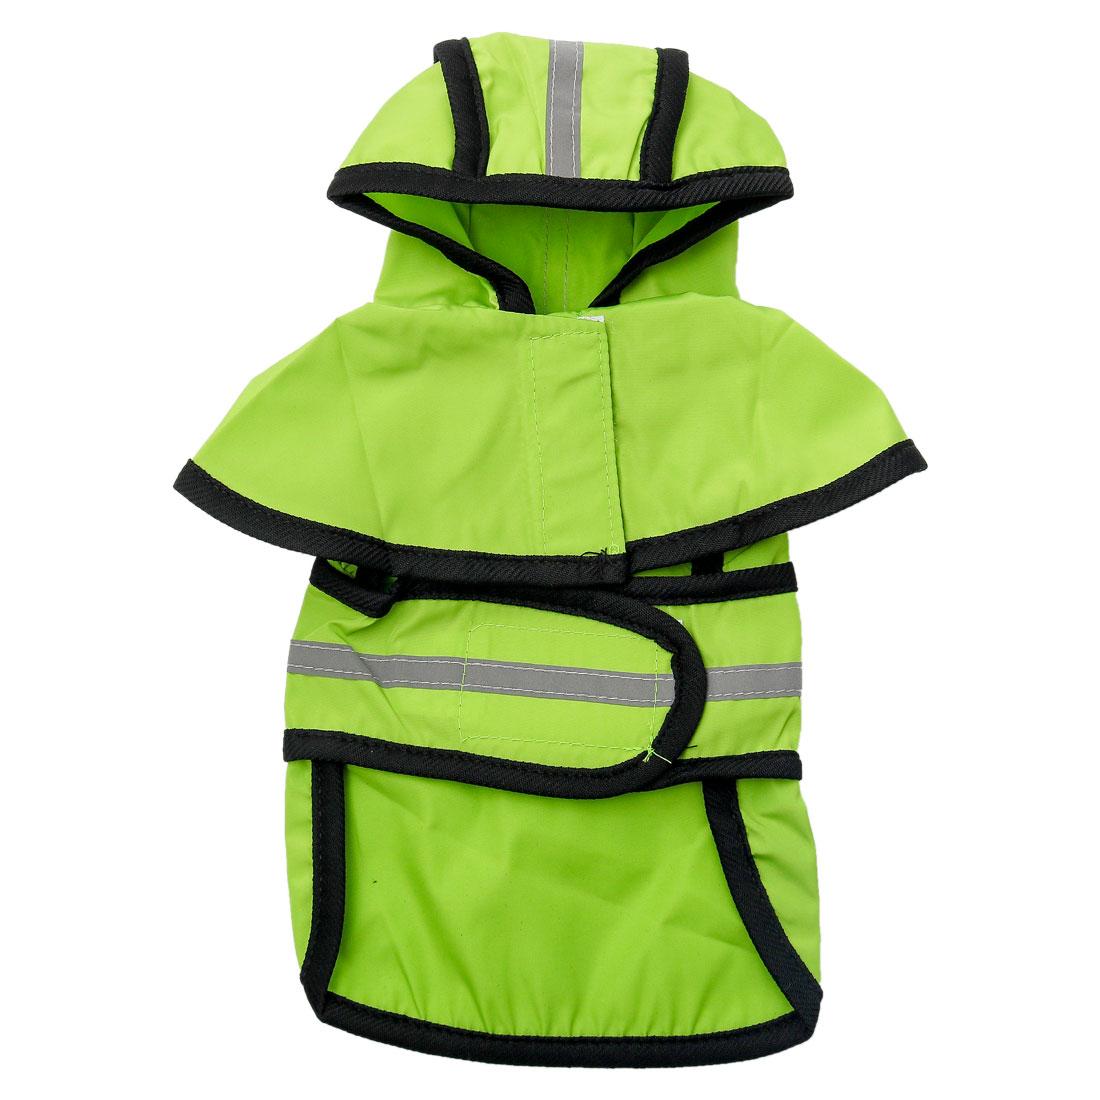 Pet Dogs Raincoat Rain Jacket Poncho Cloth Water-resistant Rainwears Green L